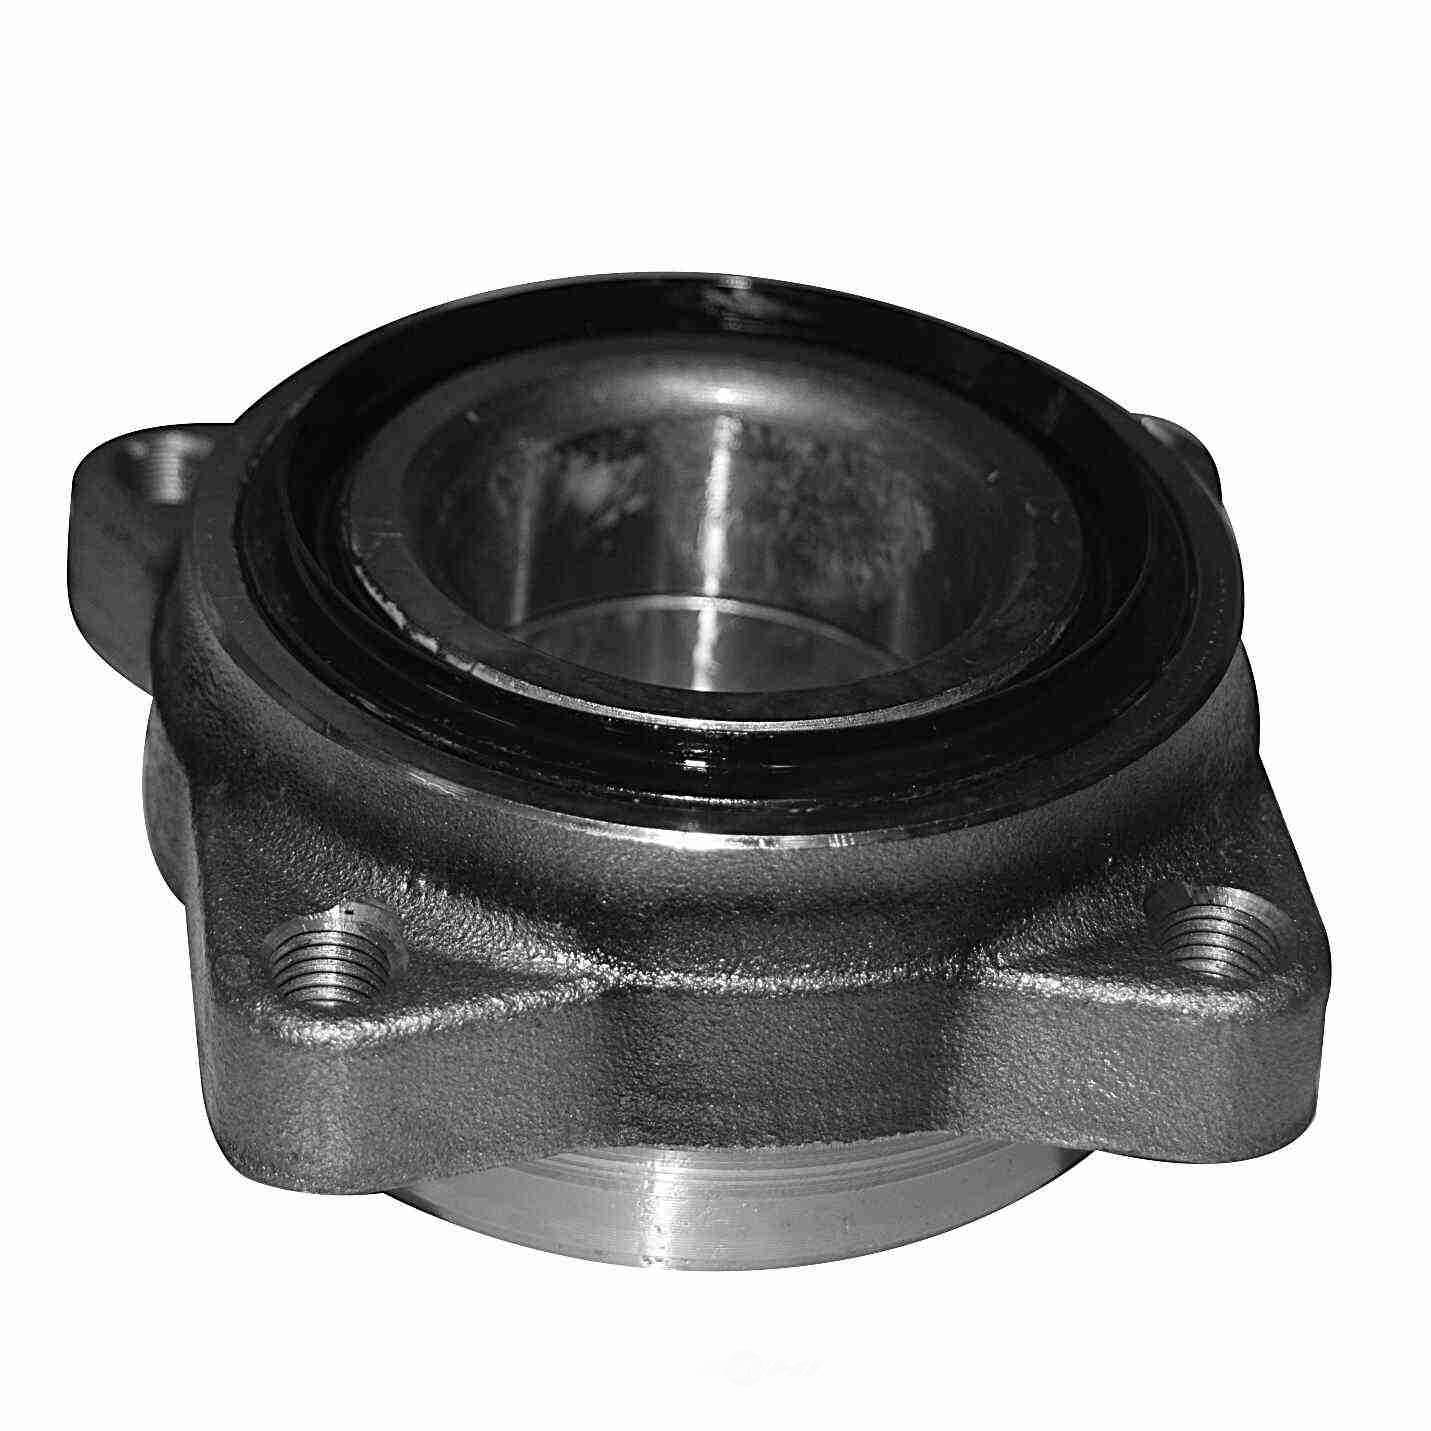 GSP NORTH AMERICA INC. - Wheel Bearing and Hub Assembly - AD8 214098